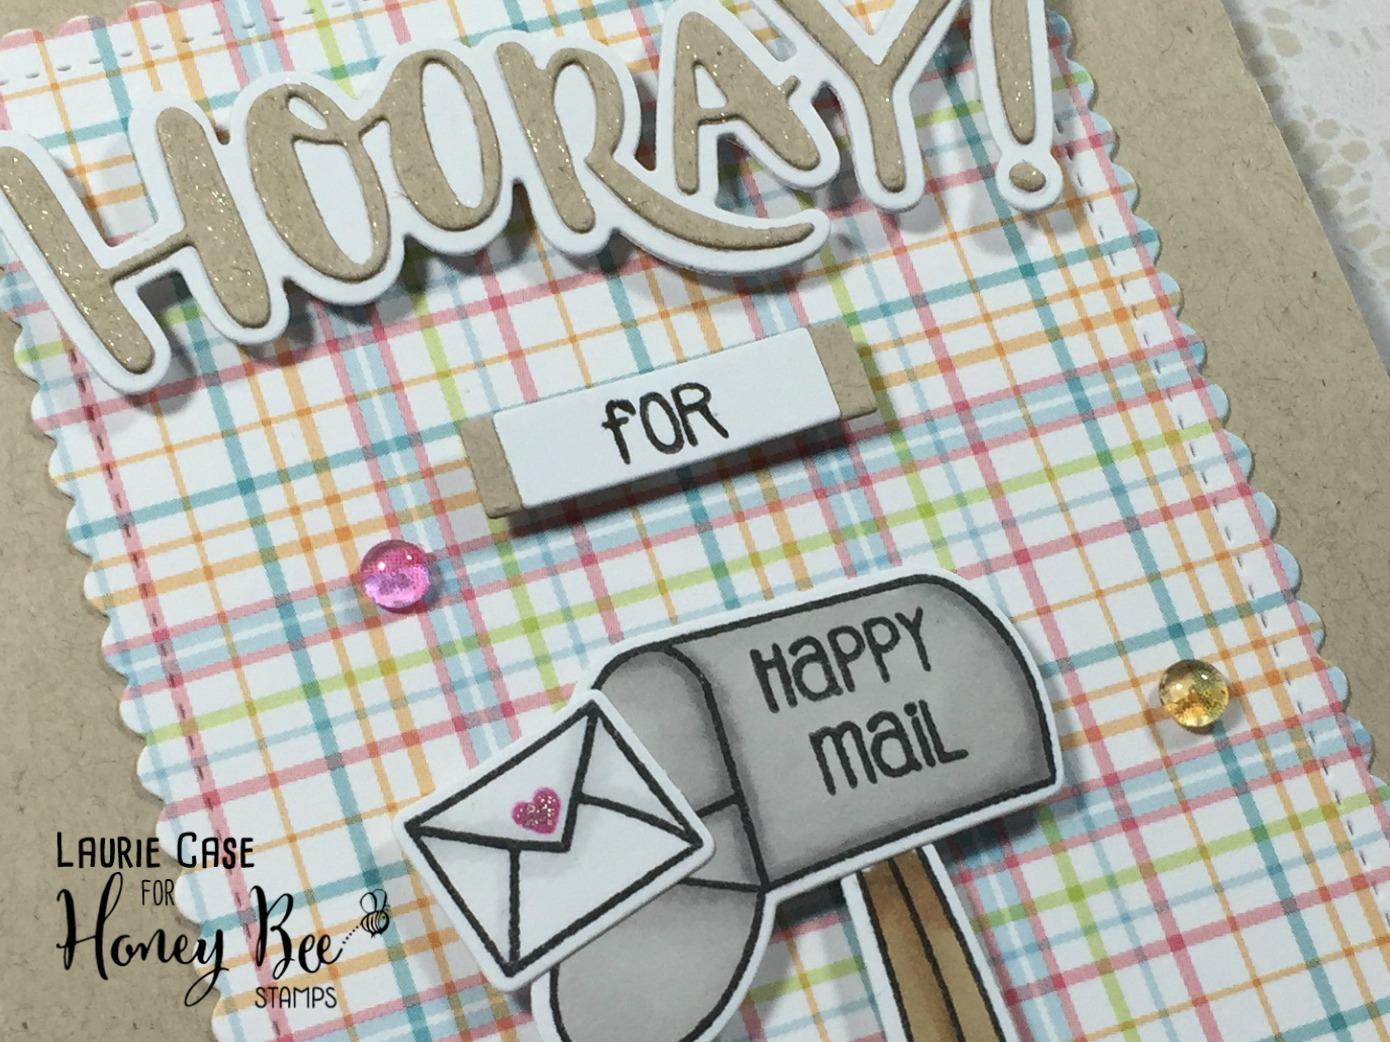 Hooray for Happy Mail!!!